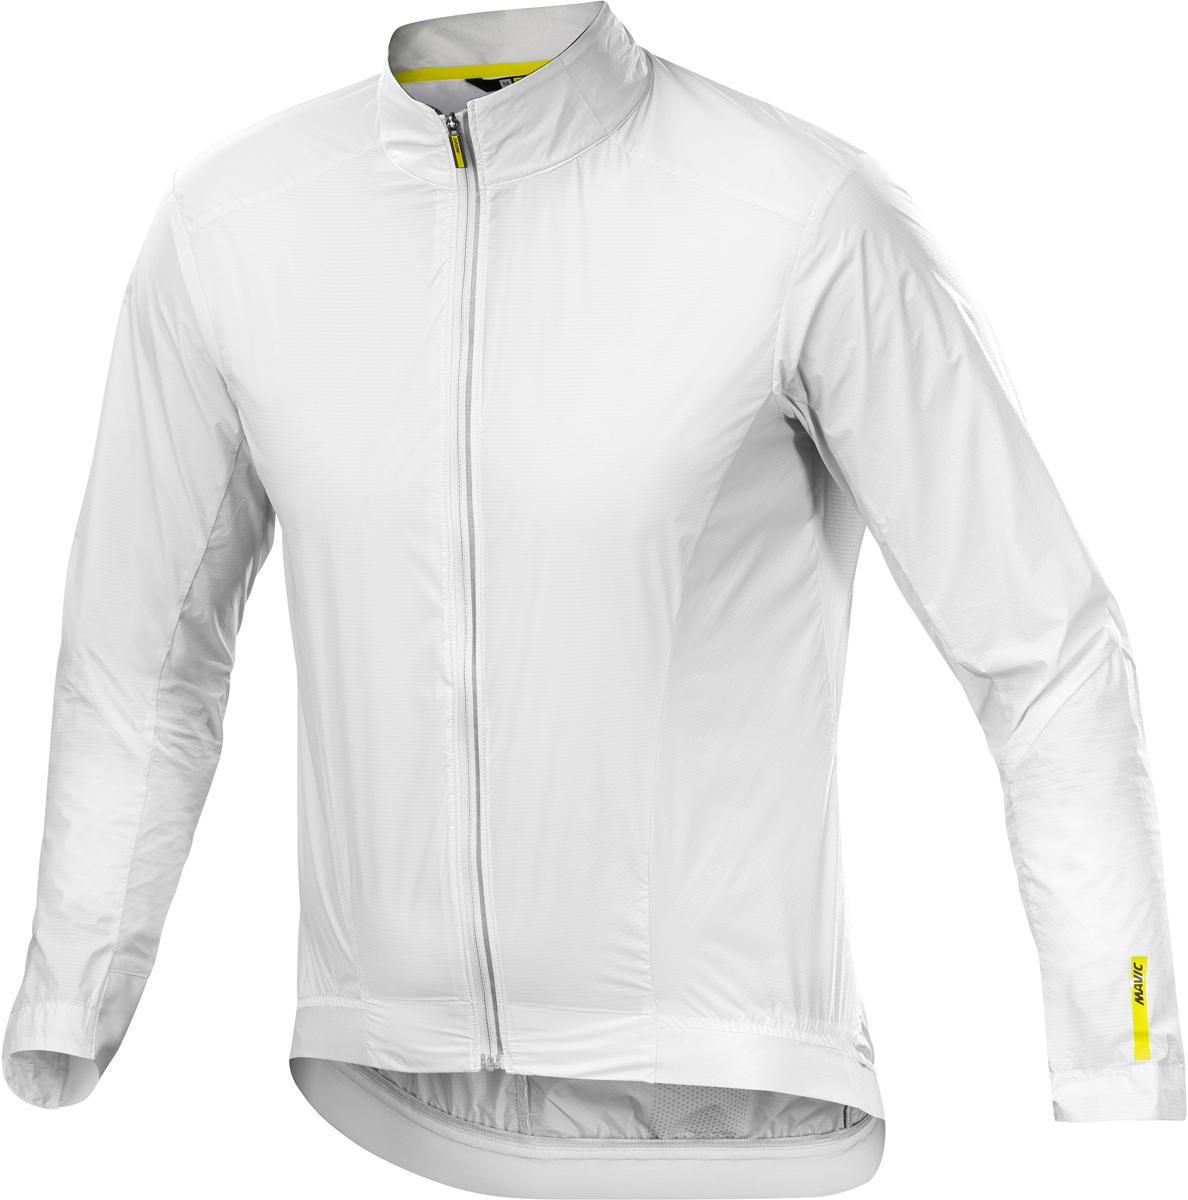 new style 2c791 4d462 Mavic Essential Fahrrad Windjacke weiß 2020